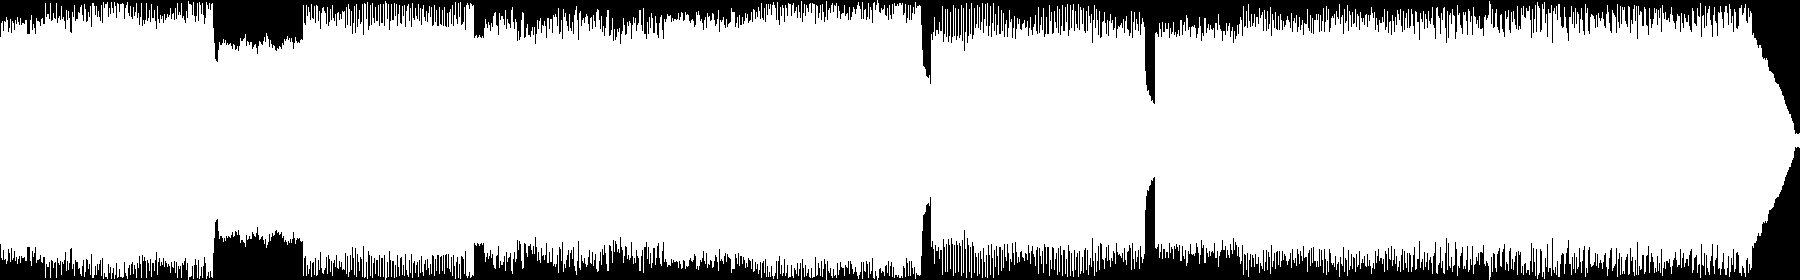 Neon Rider - Retro Synthwave audio waveform